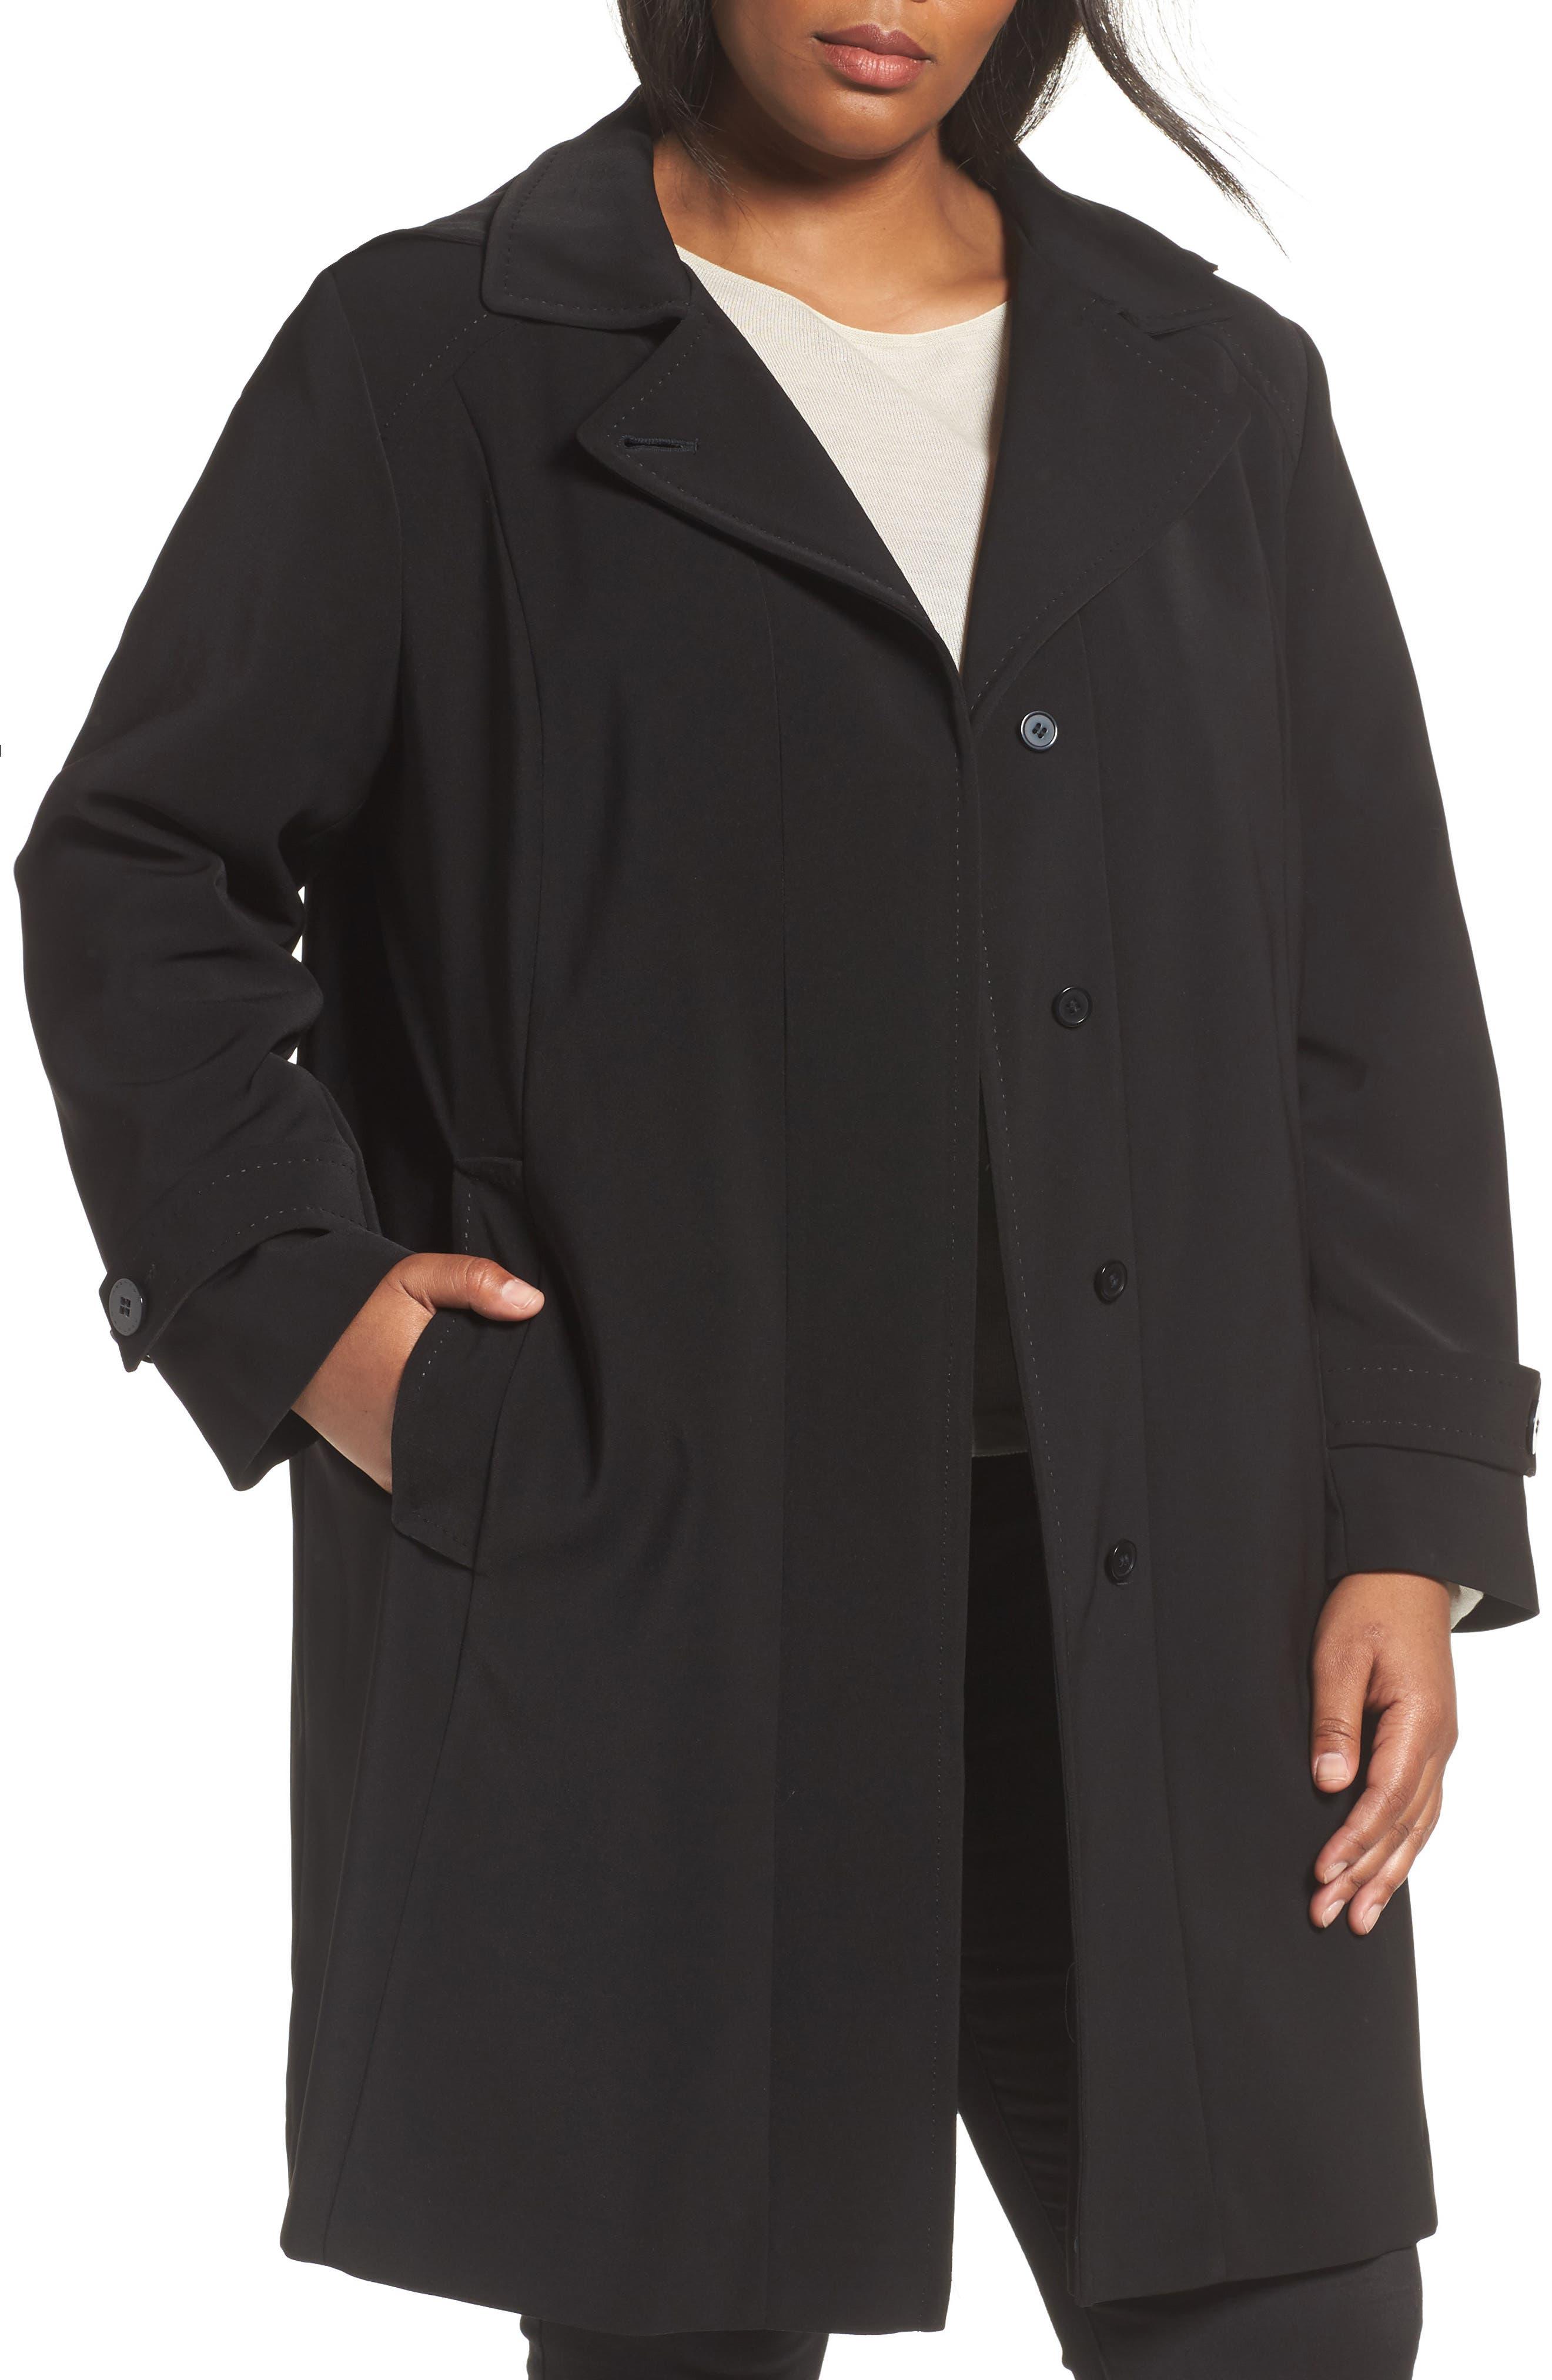 A-Line Raincoat with Detachable Hood & Liner,                         Main,                         color, 001